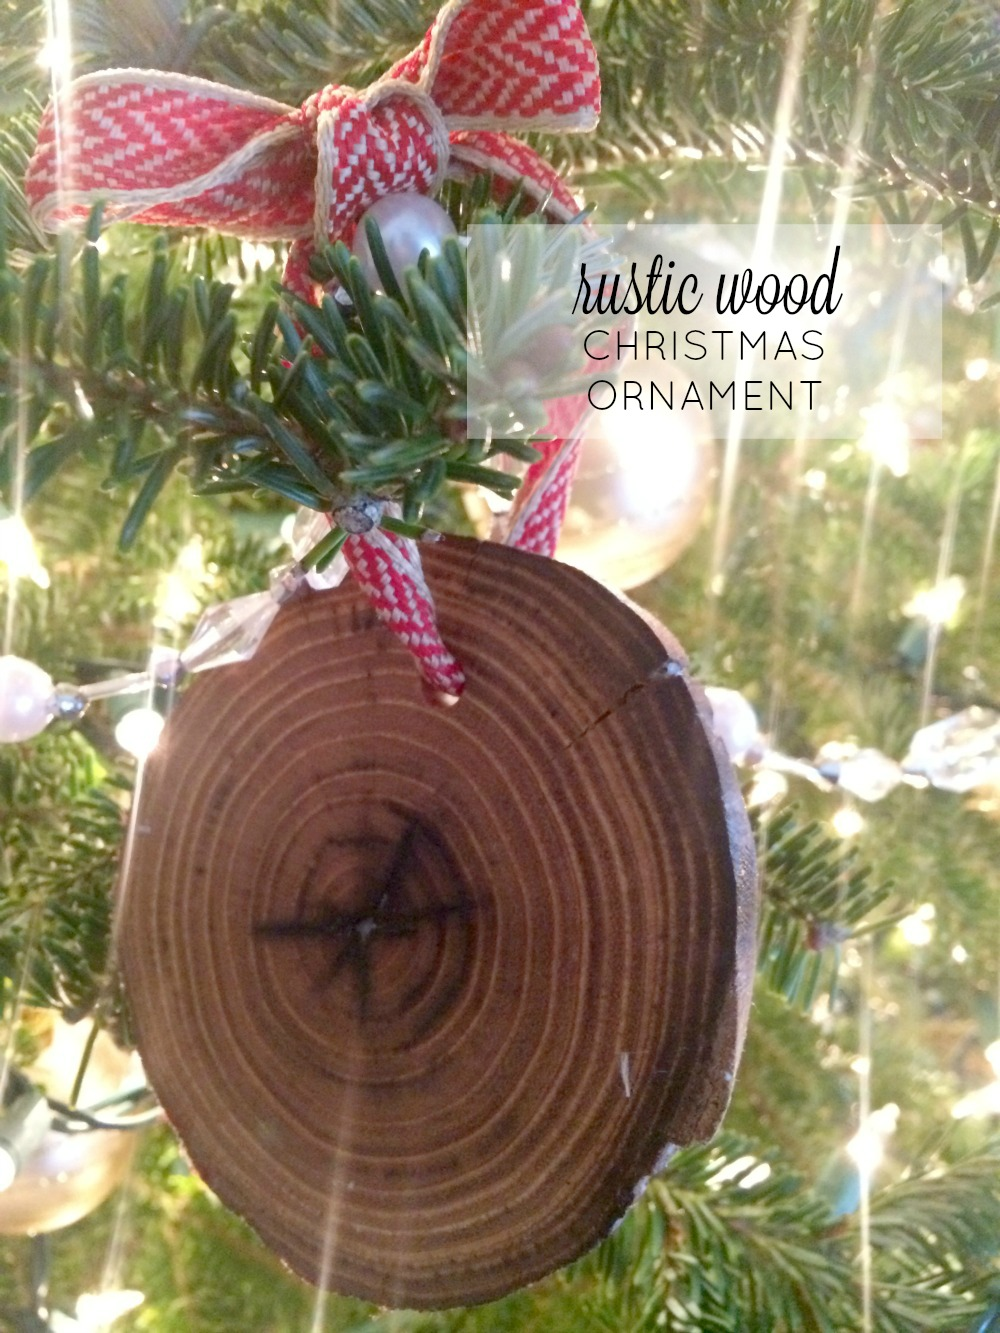 Rustic Wood Christmas Ornaments F A R M H O U S E M A D E